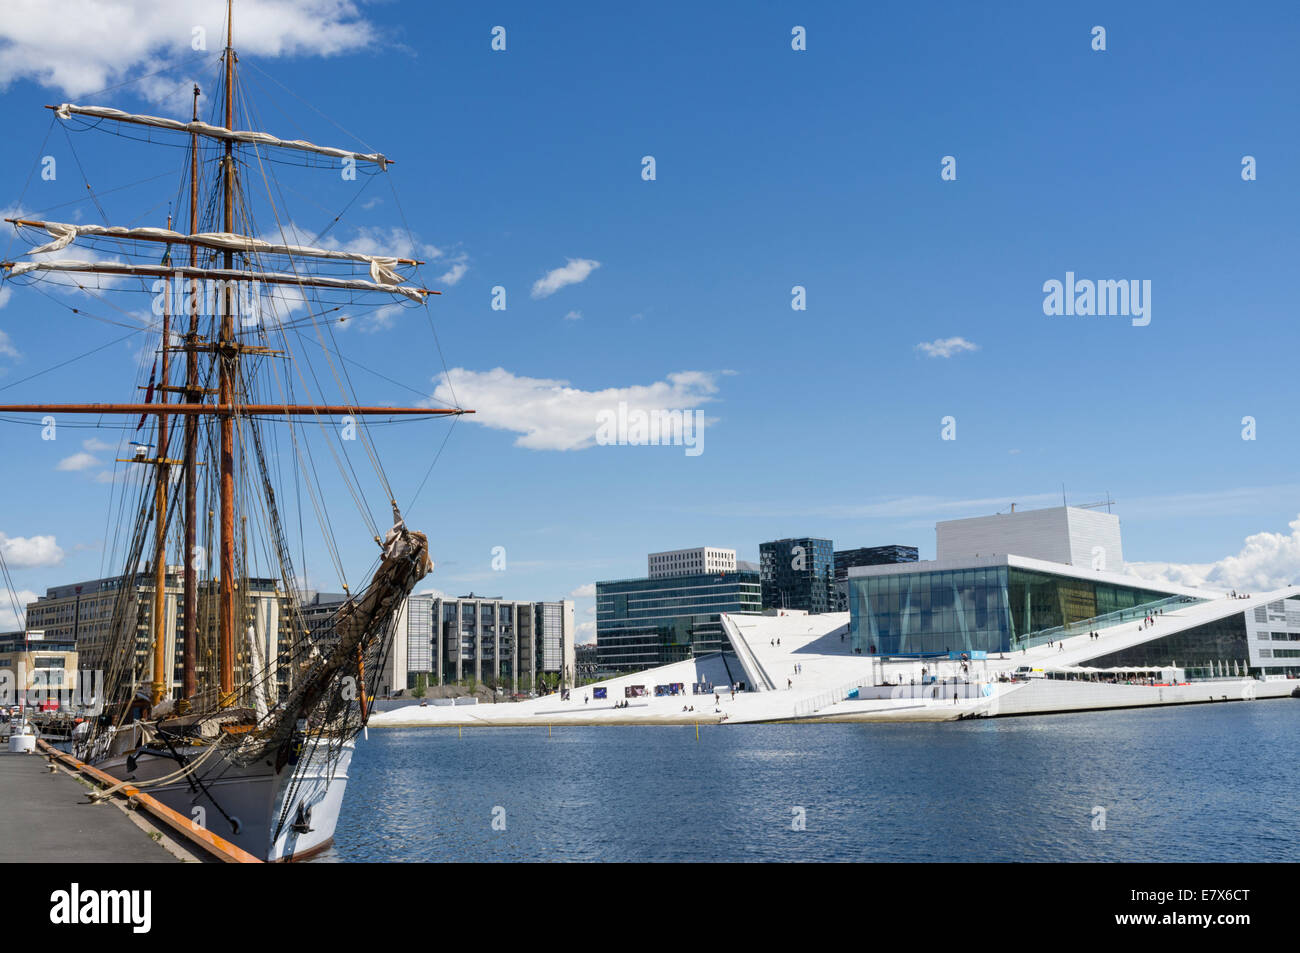 Sailboat and Opera Hall, Oslo, Norway - Stock Image